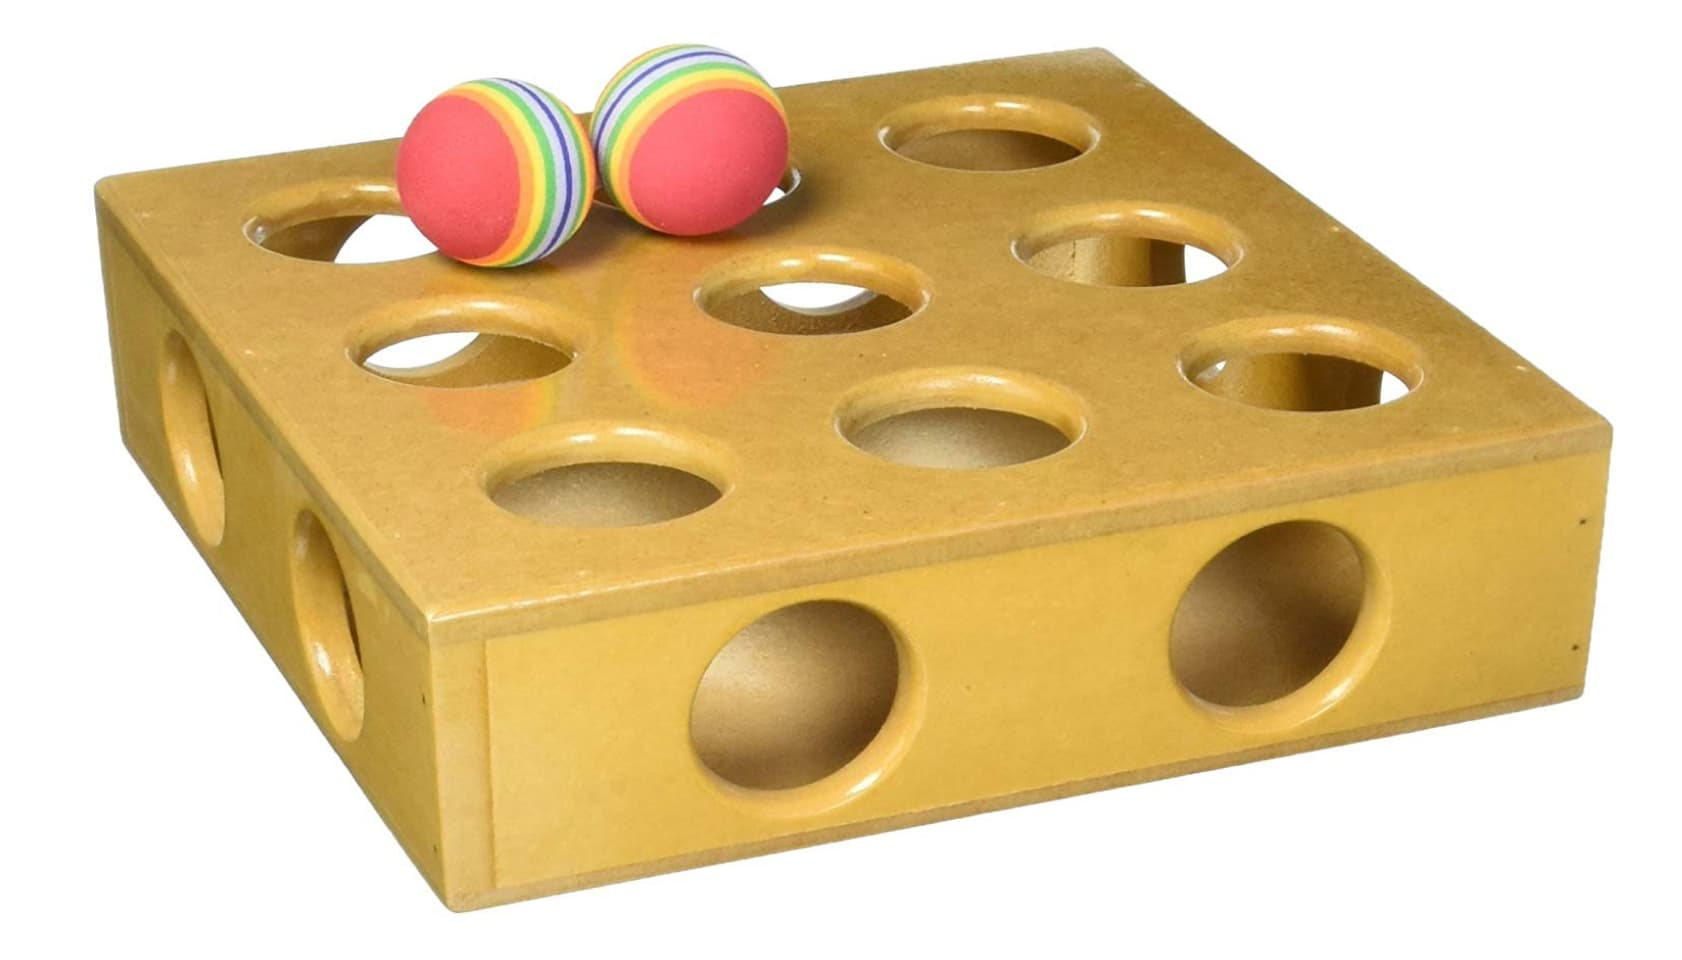 Smart Cat puzzle toy